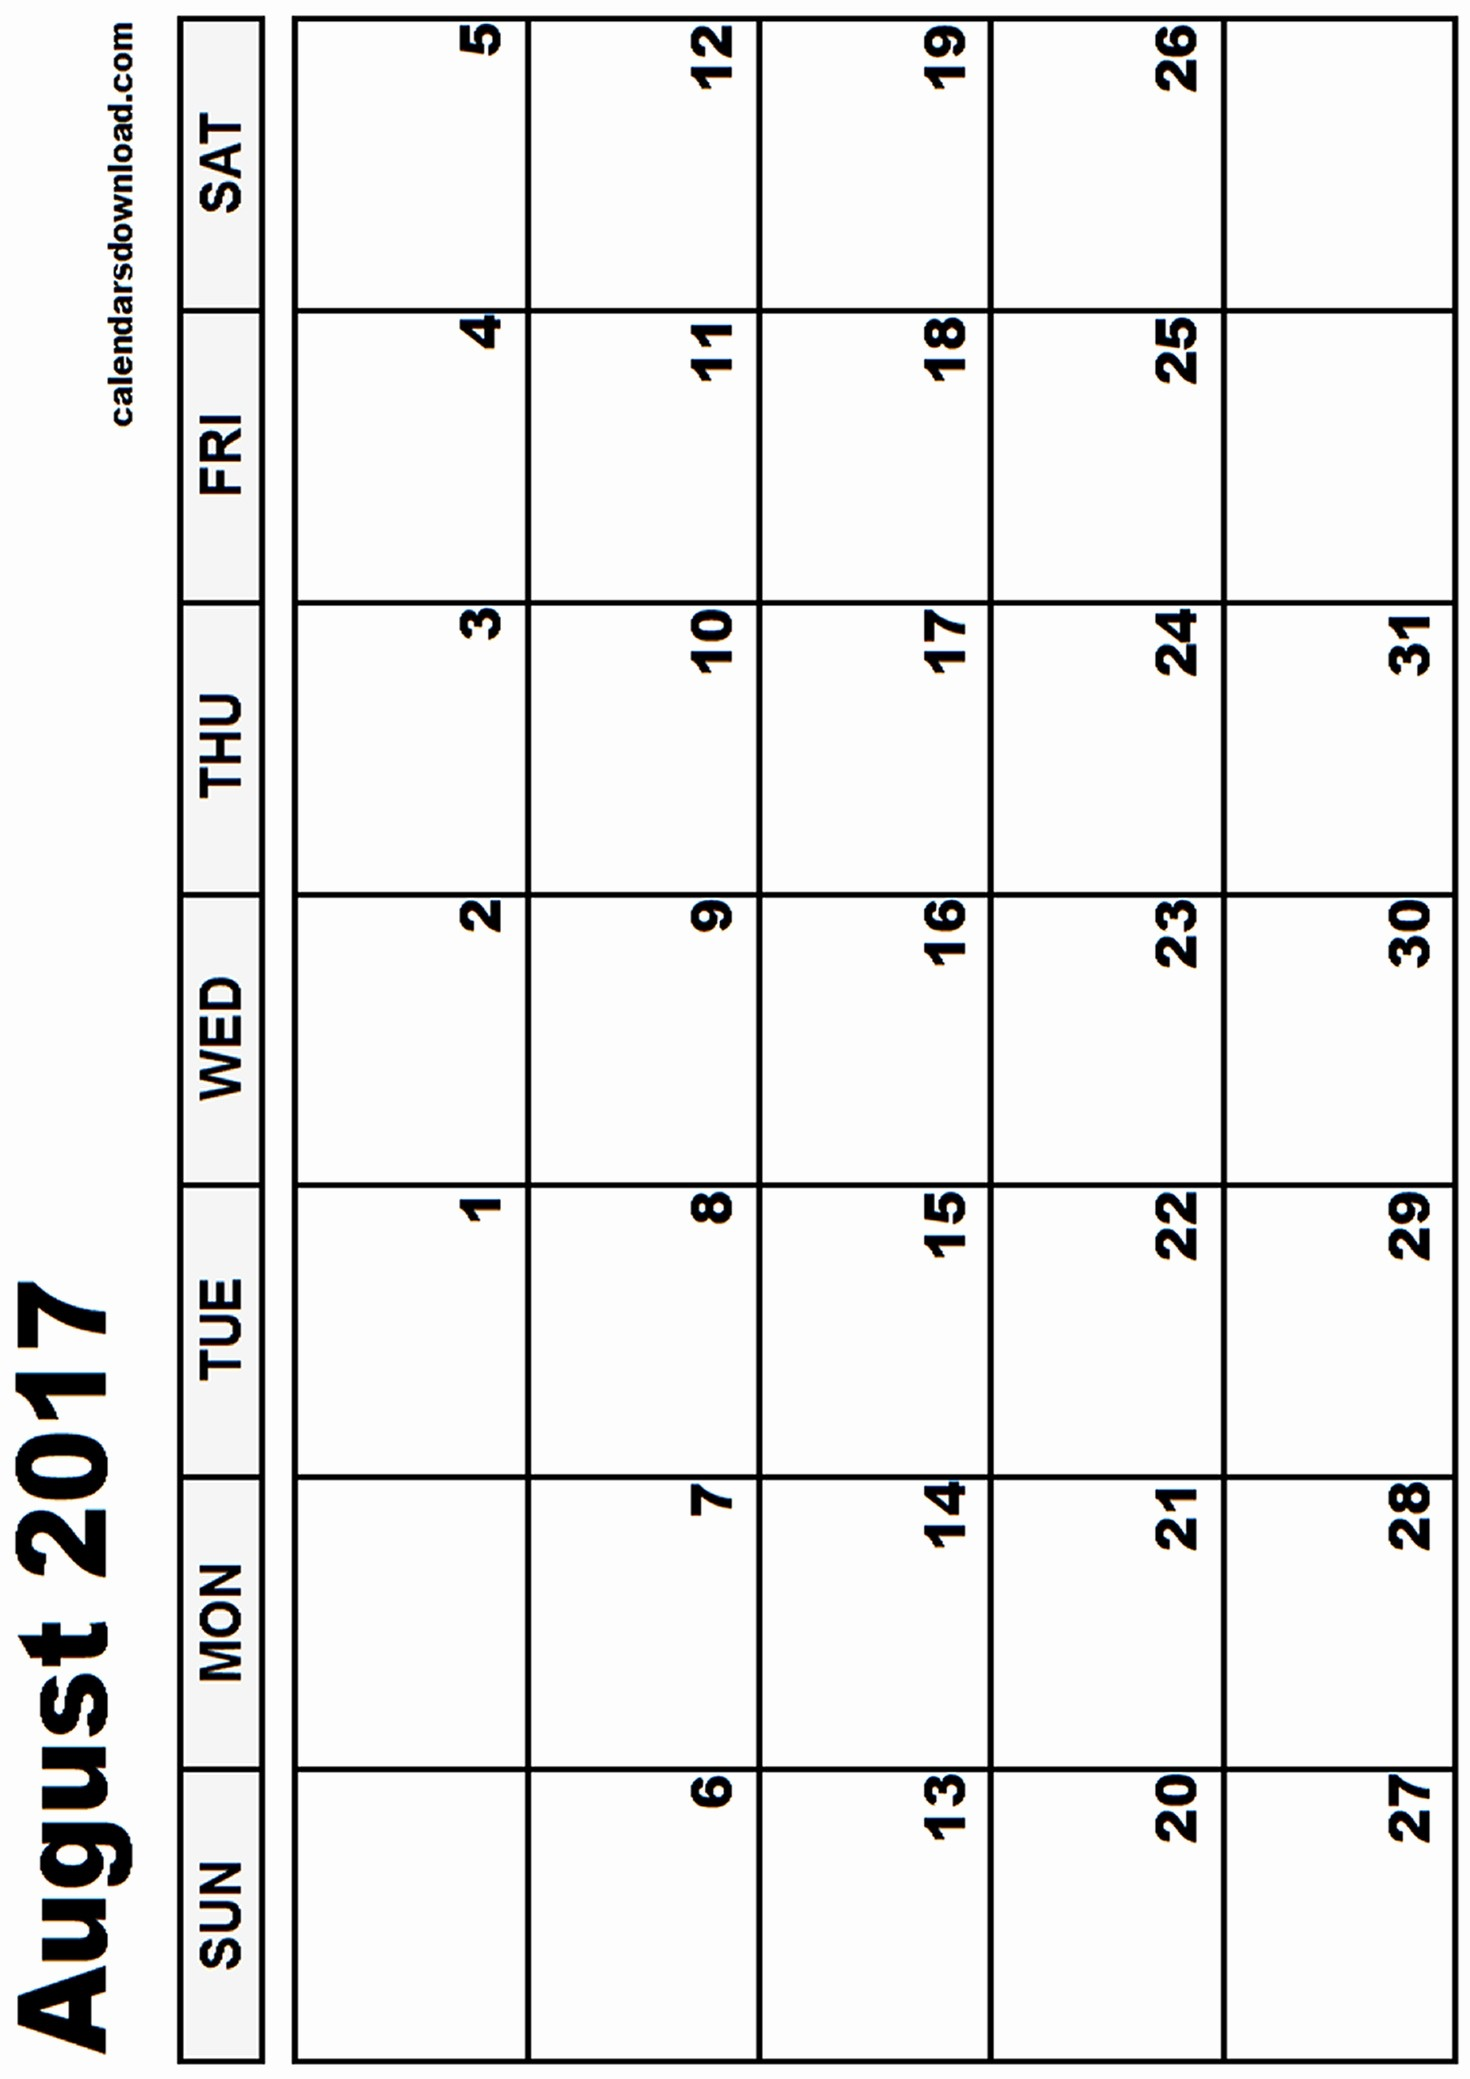 Blank Calendar Template August 2017 Unique August 2017 Calendar